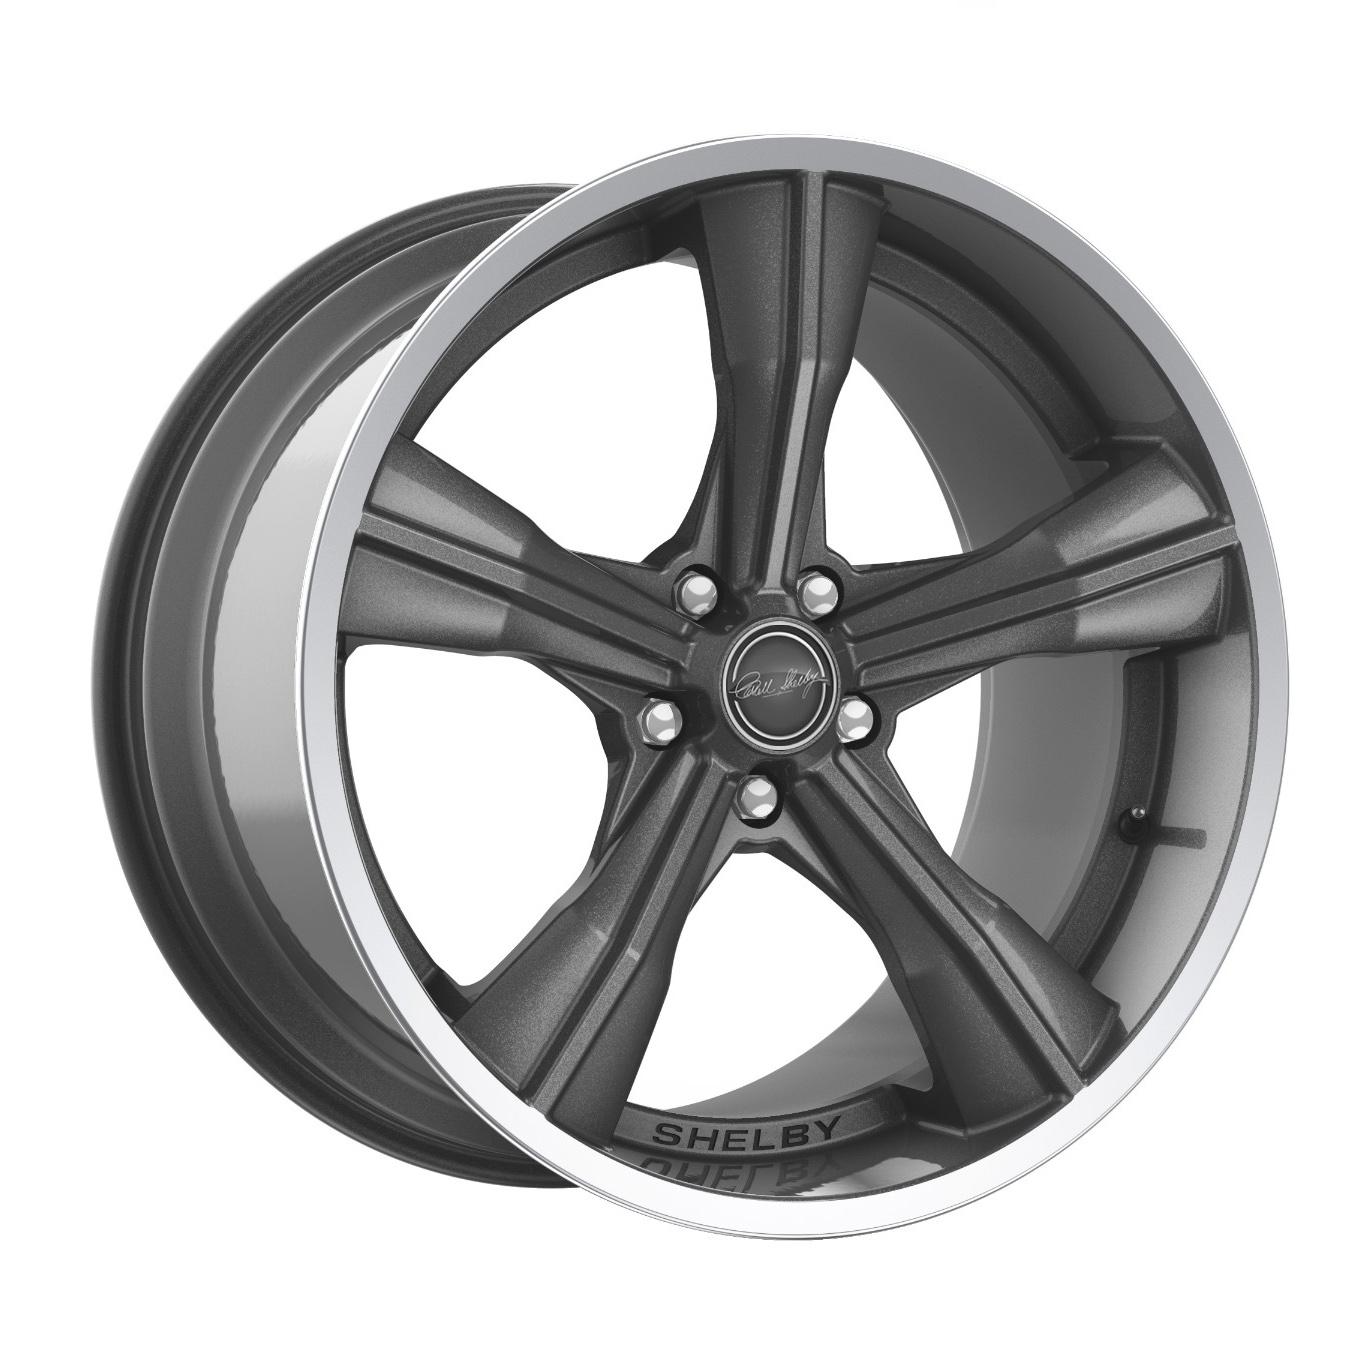 Carroll Shelby Wheels CS 11 - Gunmetal w/Polished Lip Rim